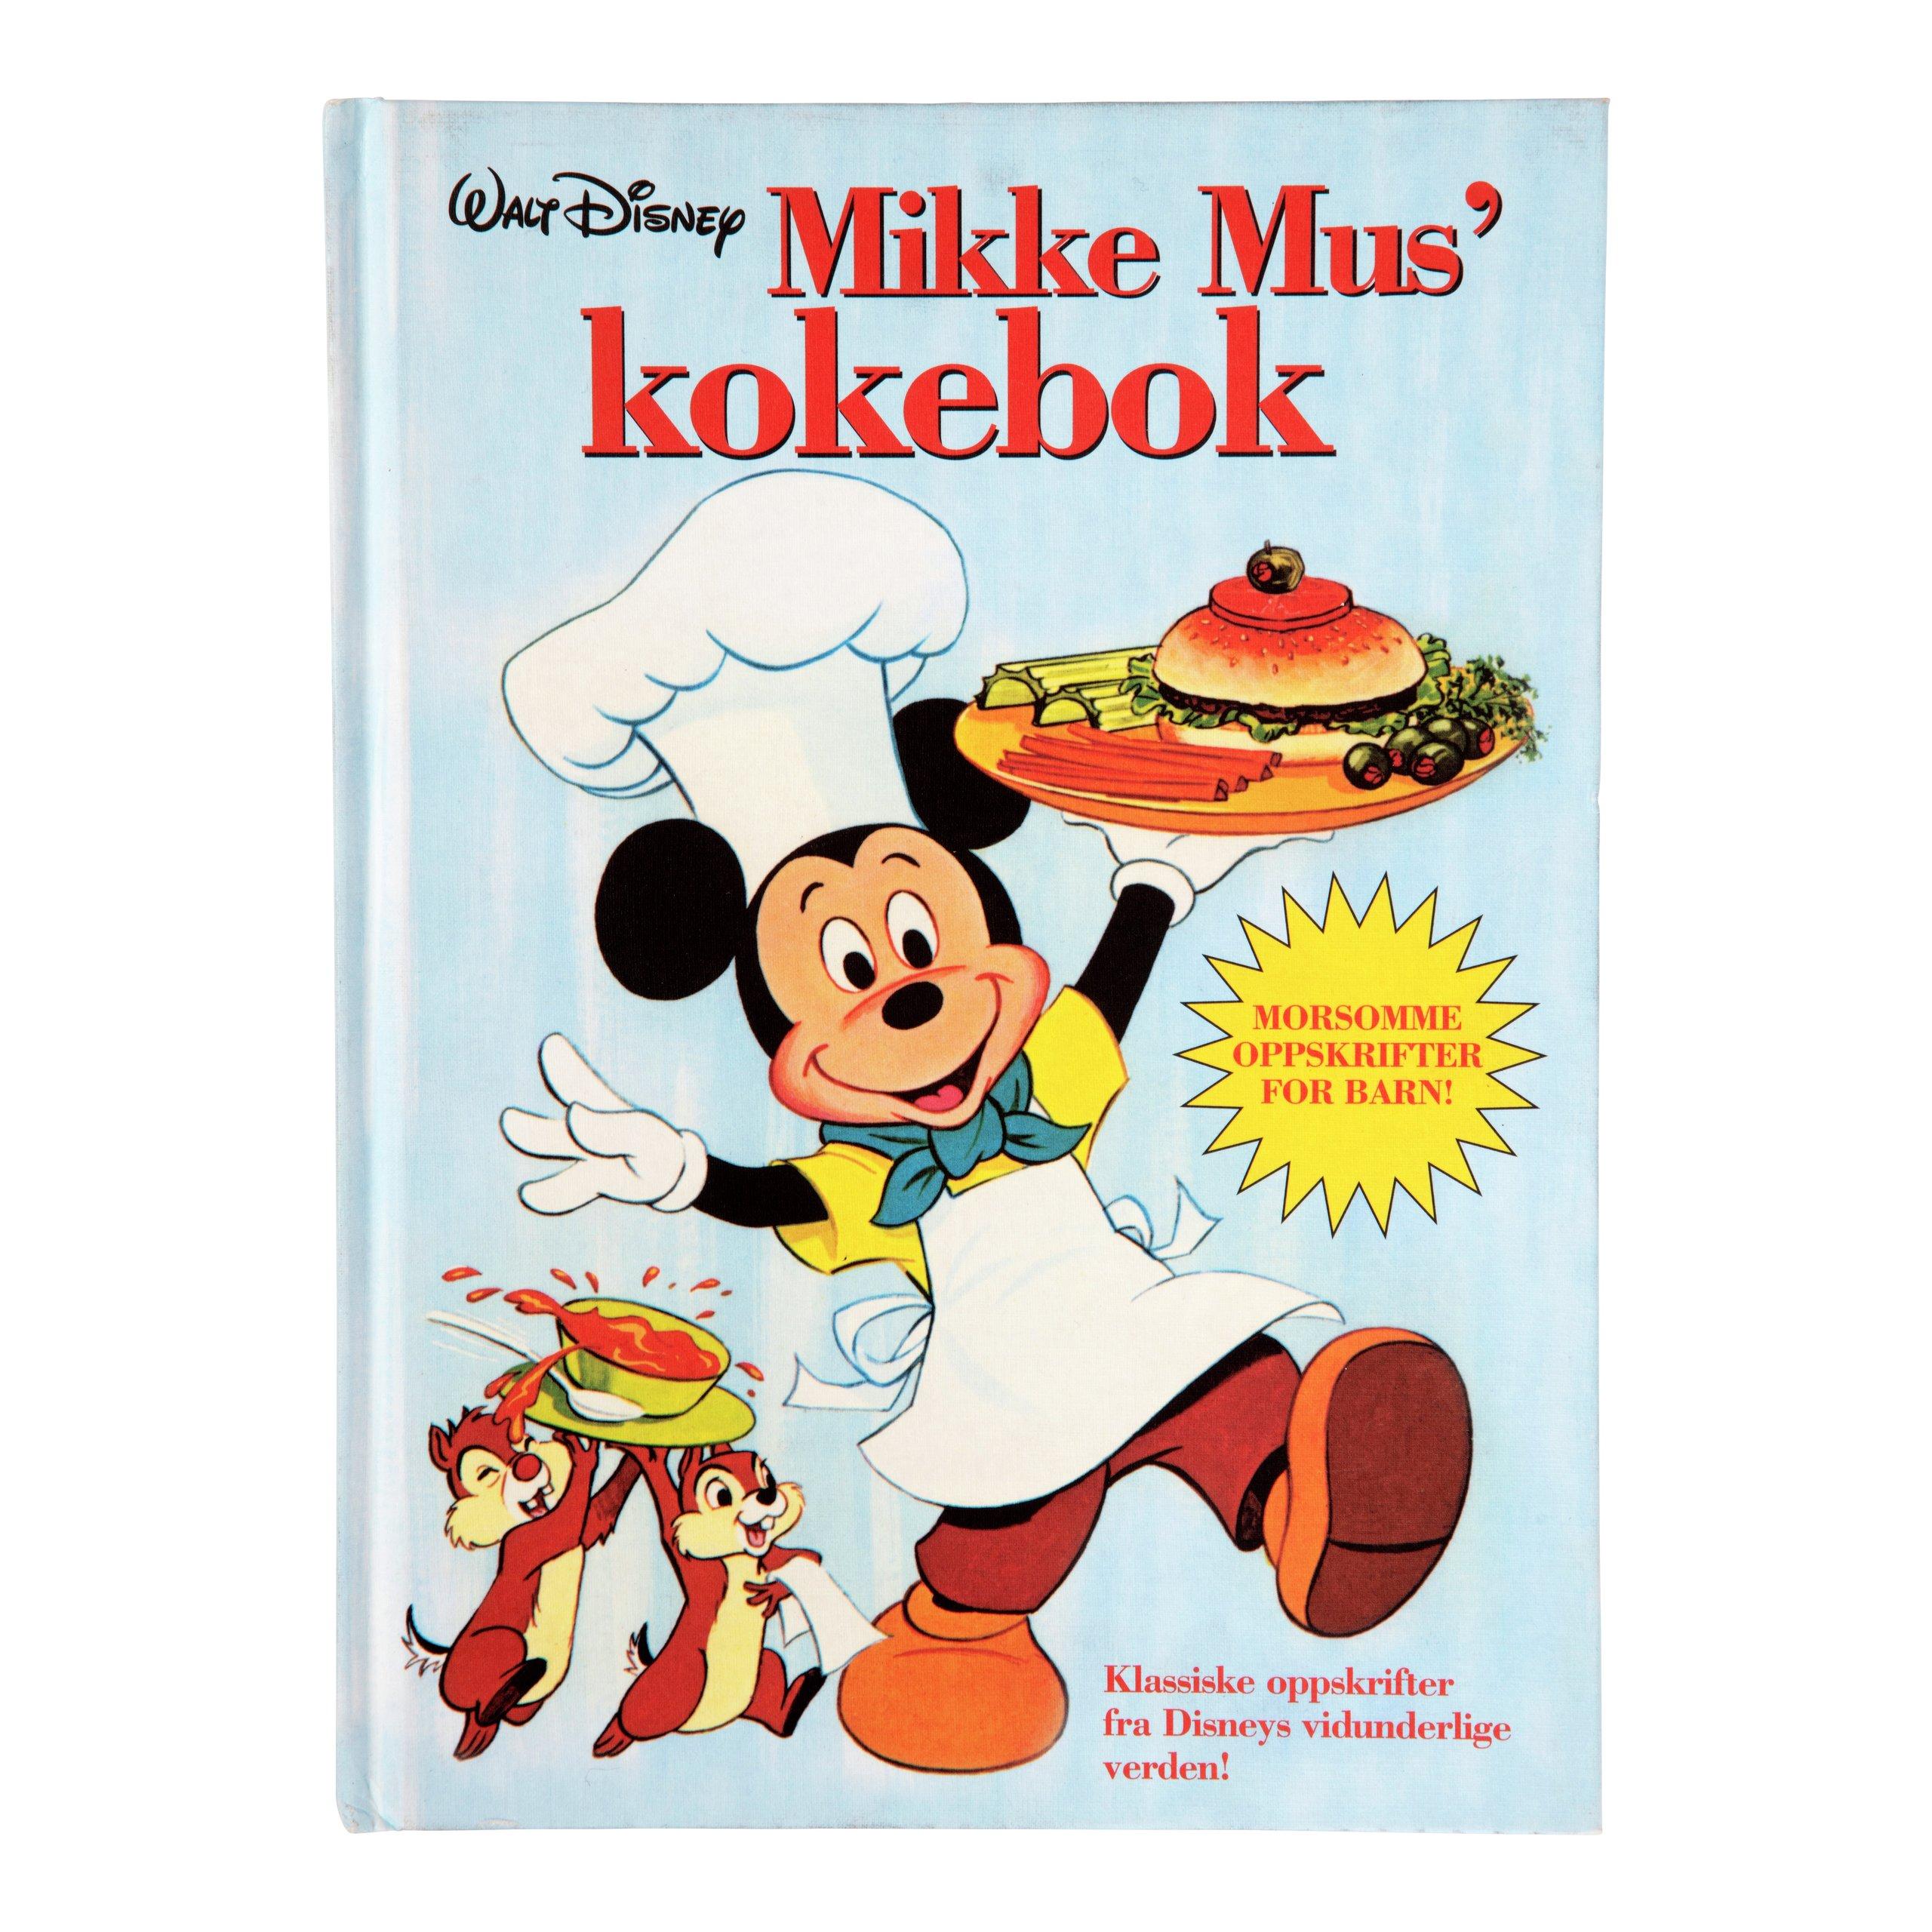 MIKKE MUS KOKEBOK-101470